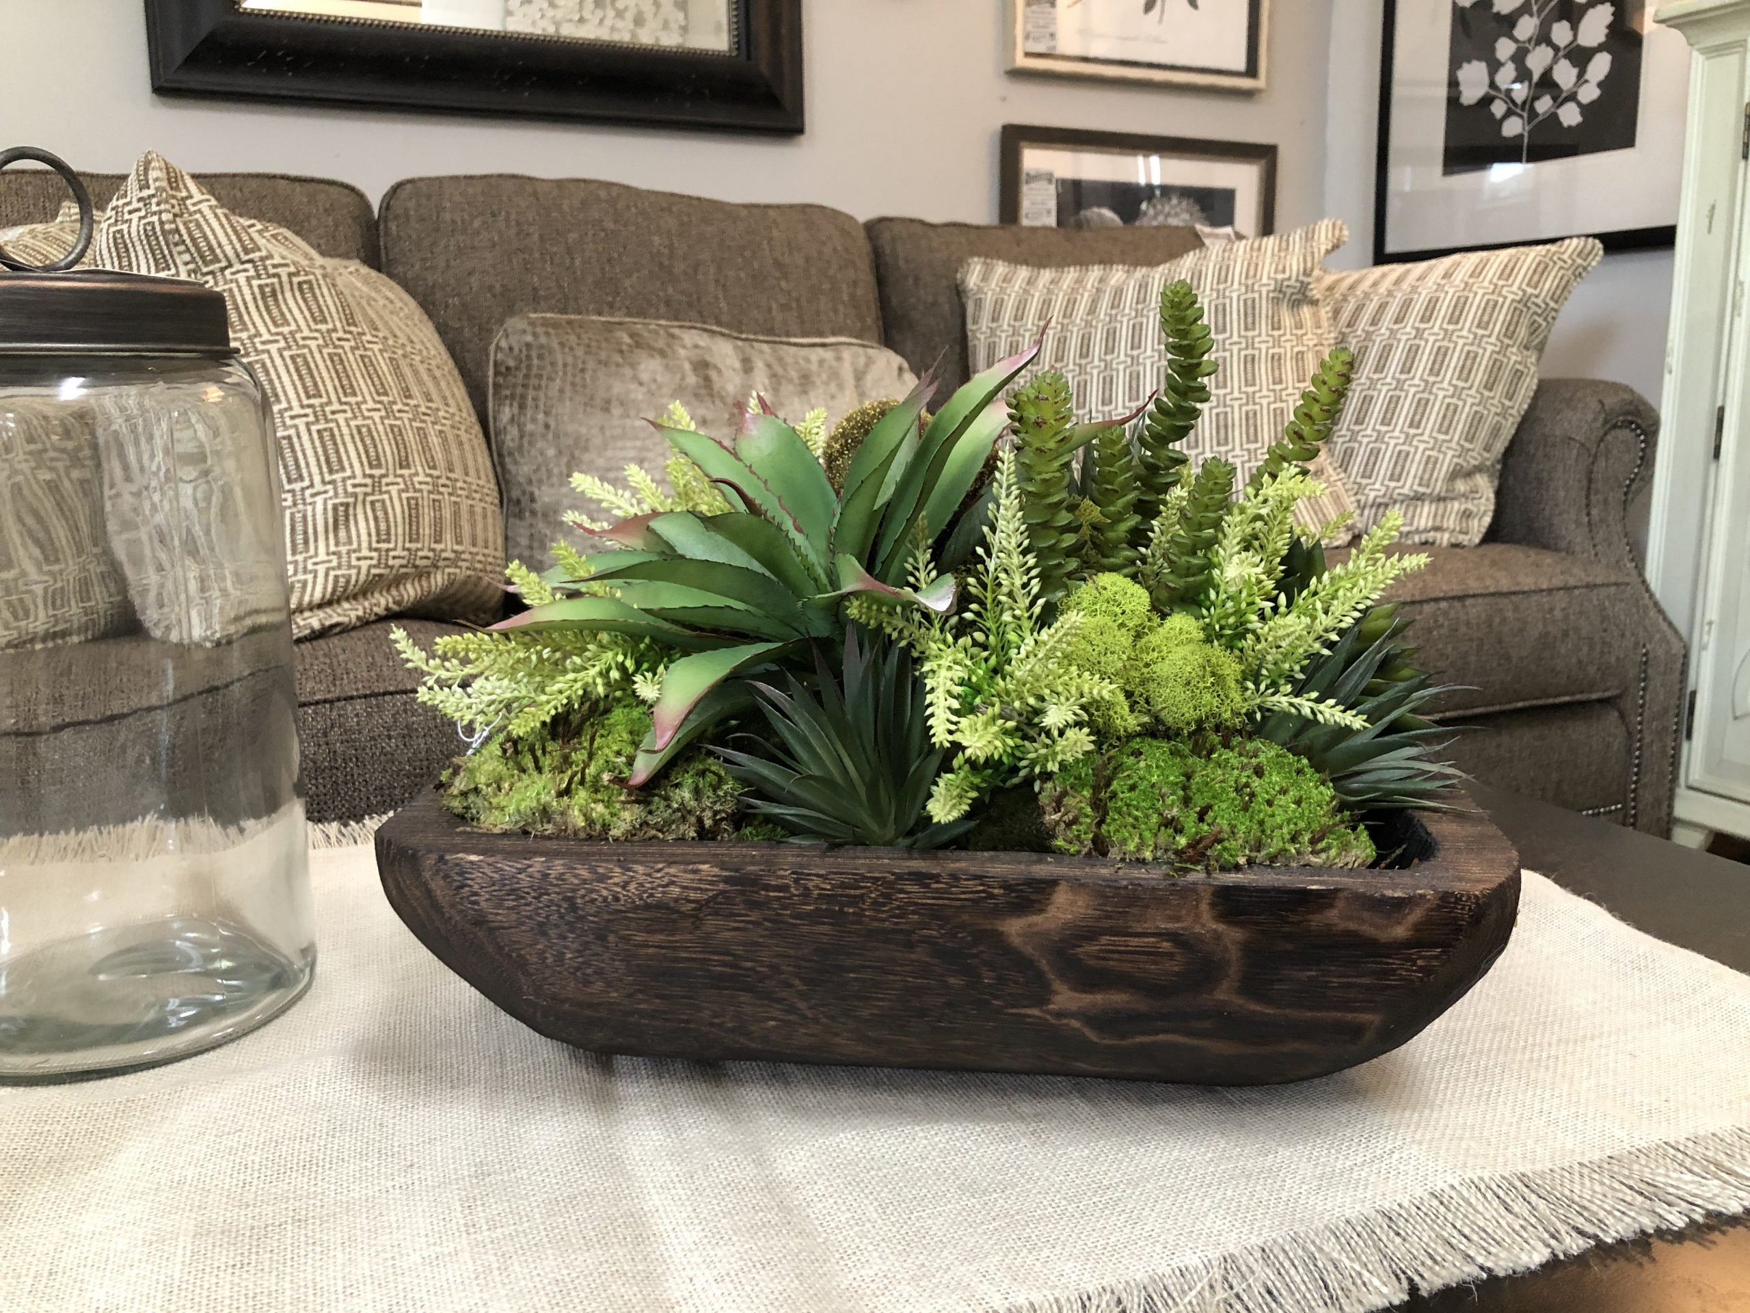 Mixed succulent arrangement in wooden square bowl